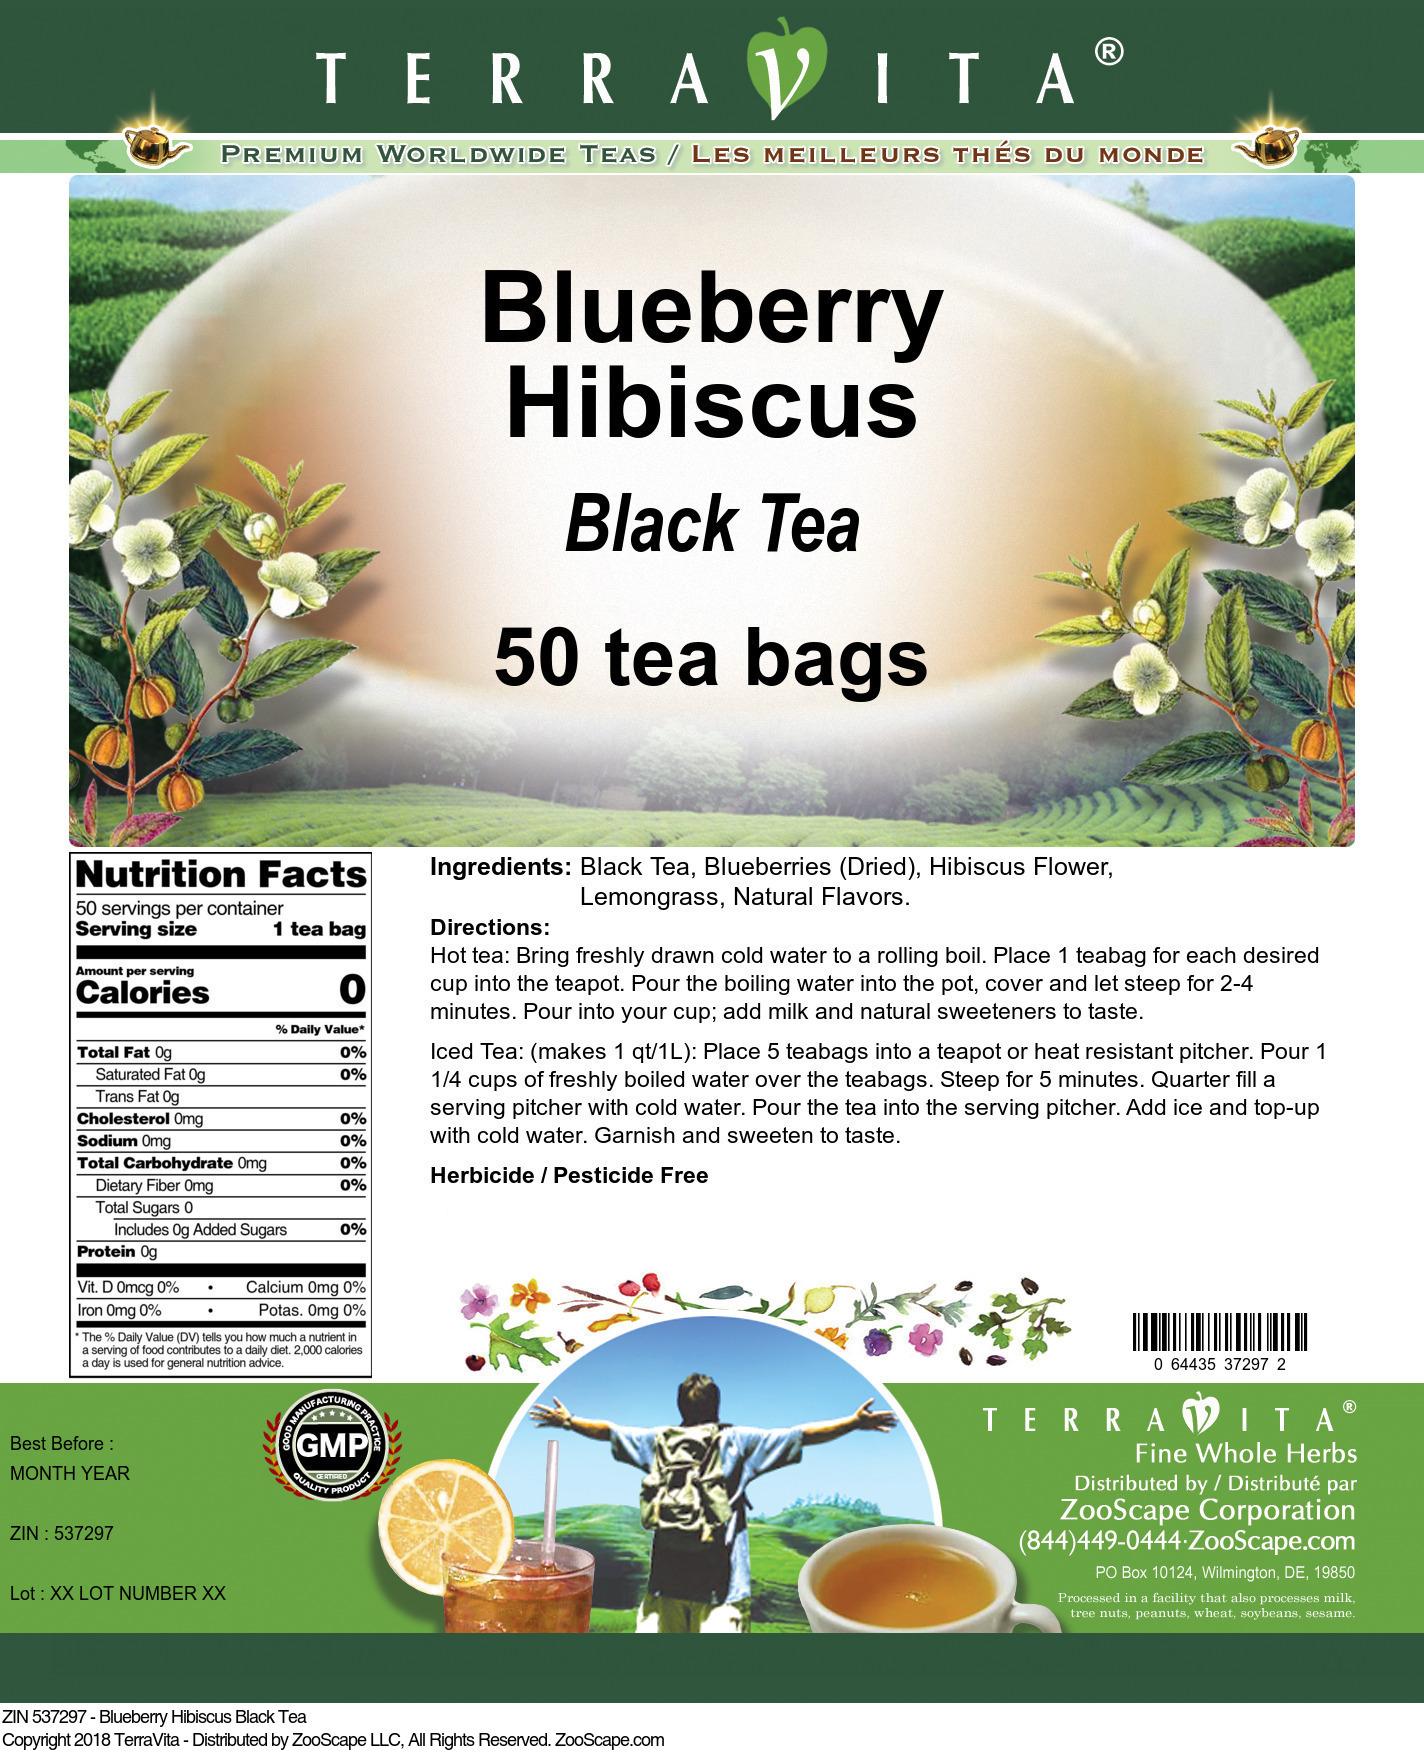 Blueberry Hibiscus Black Tea